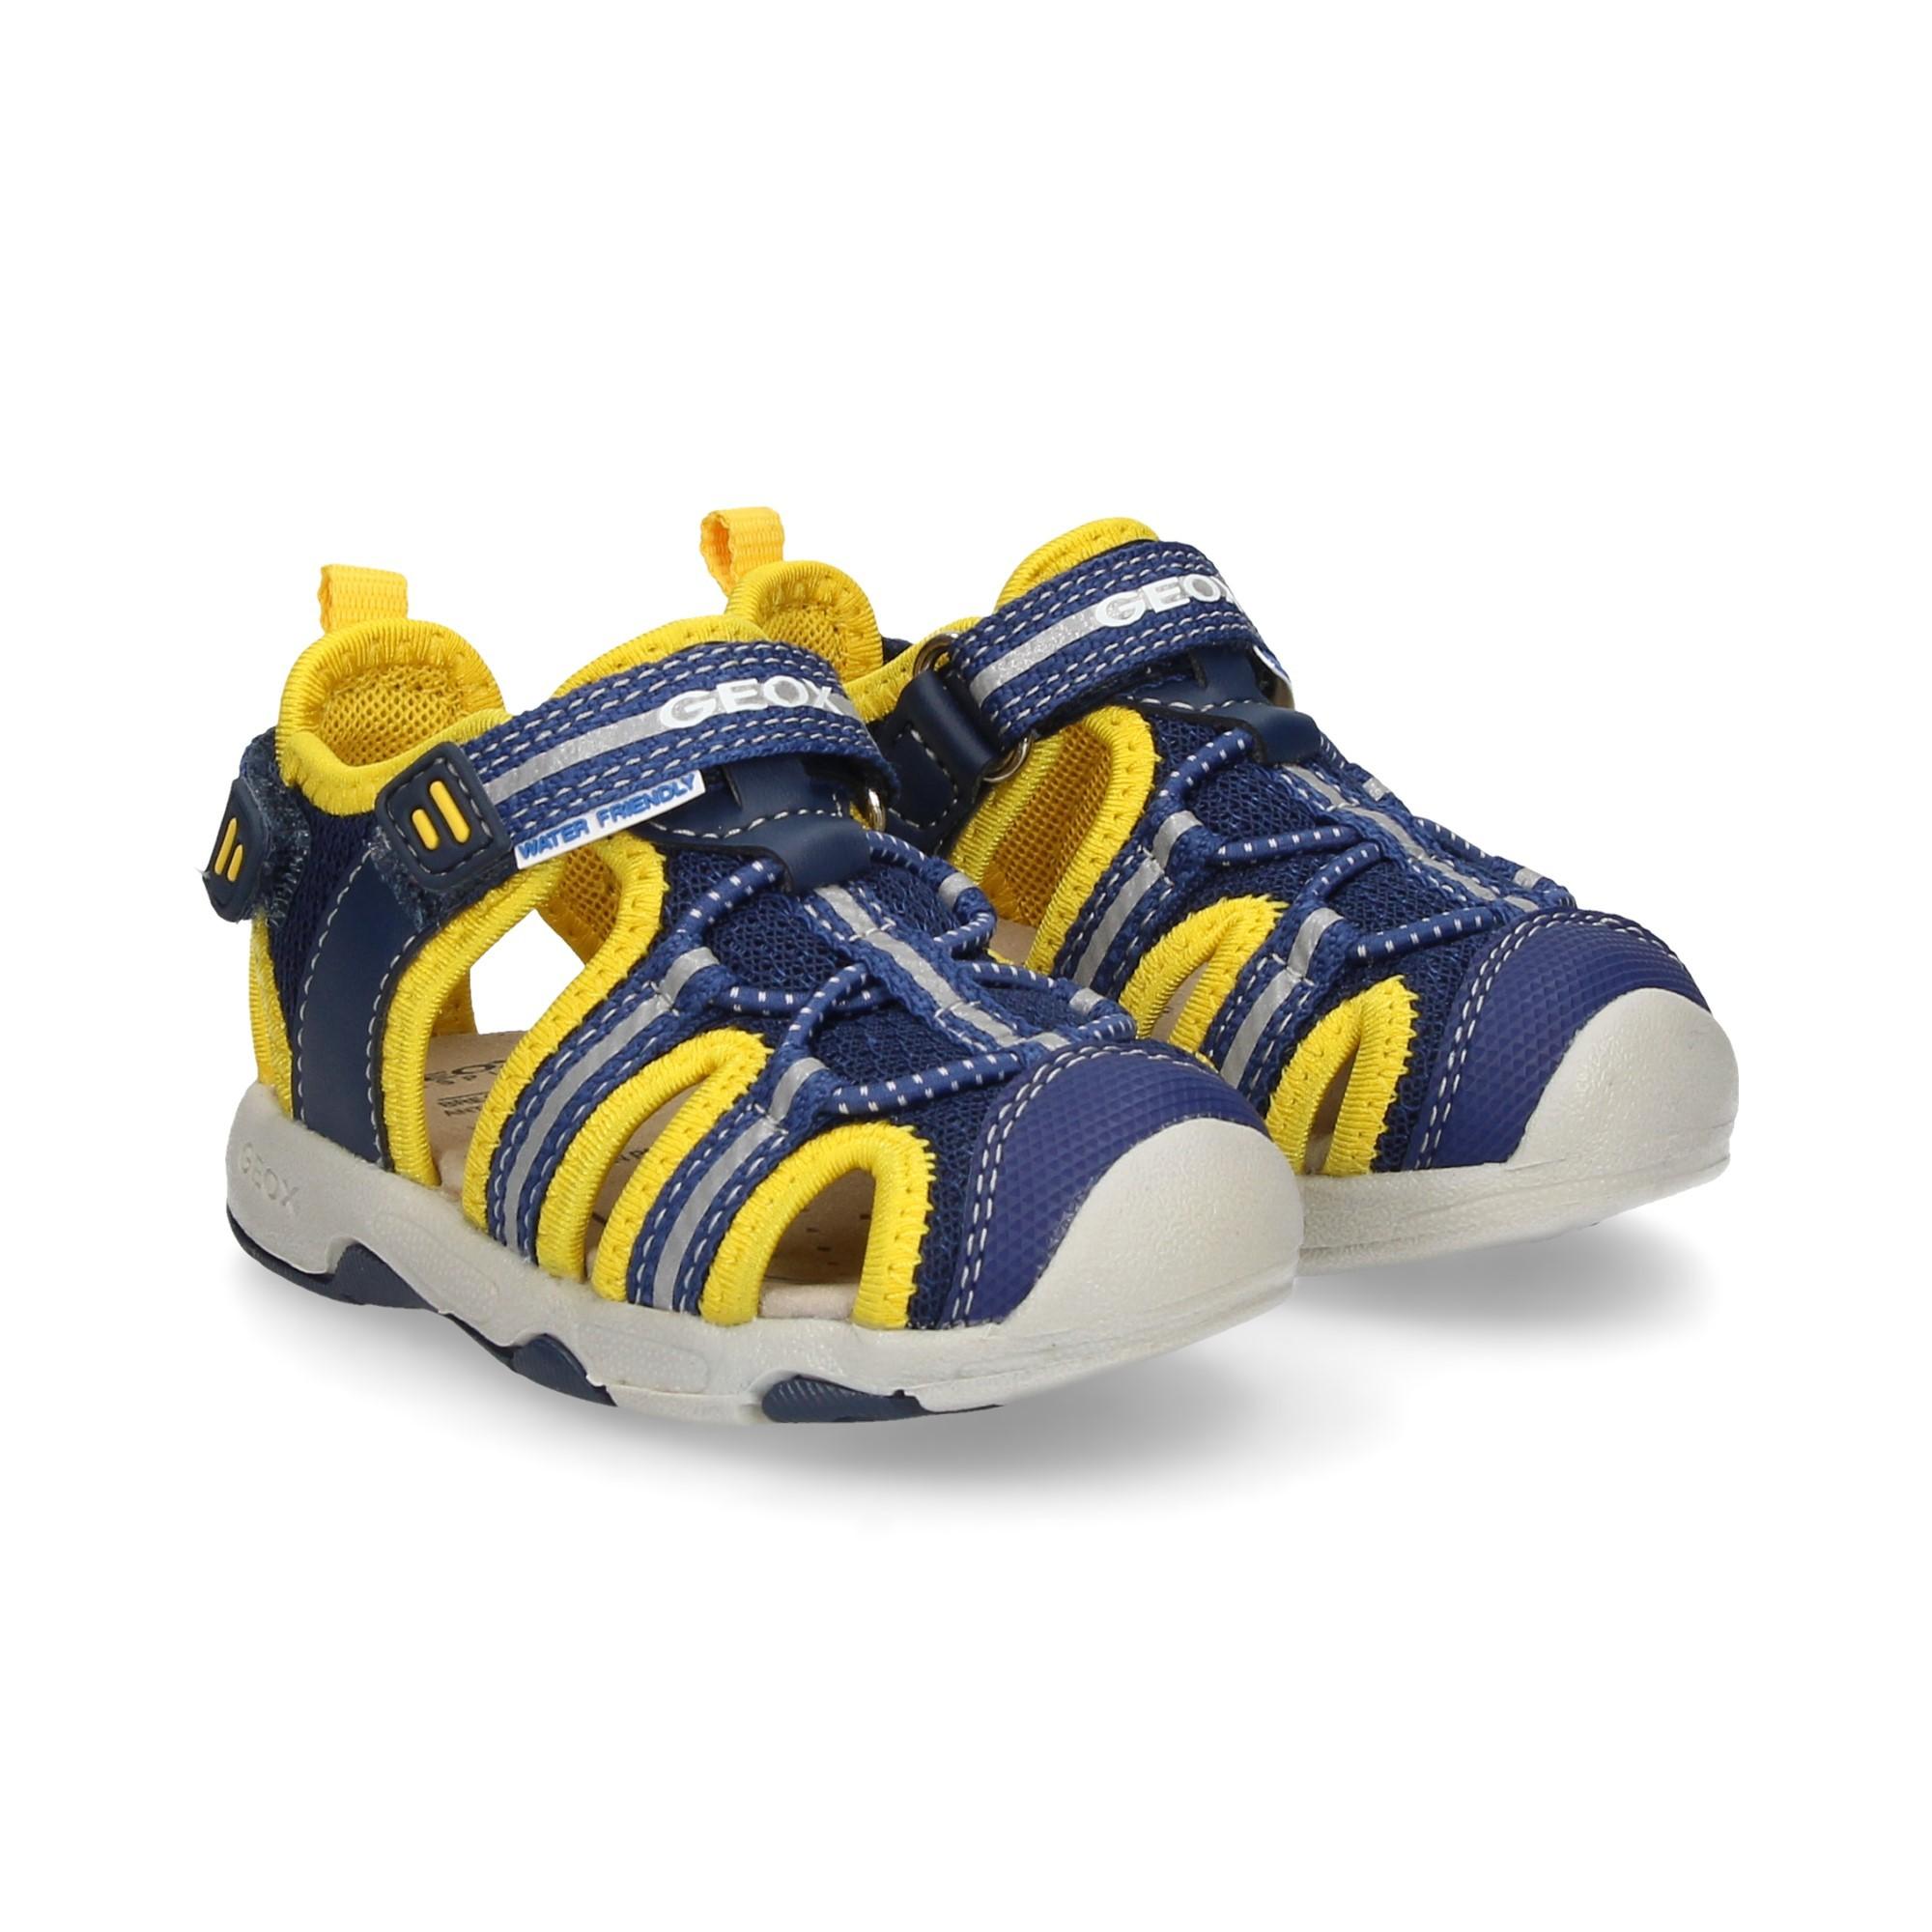 GEOX Boys sandals and flip flops B920FB C0657